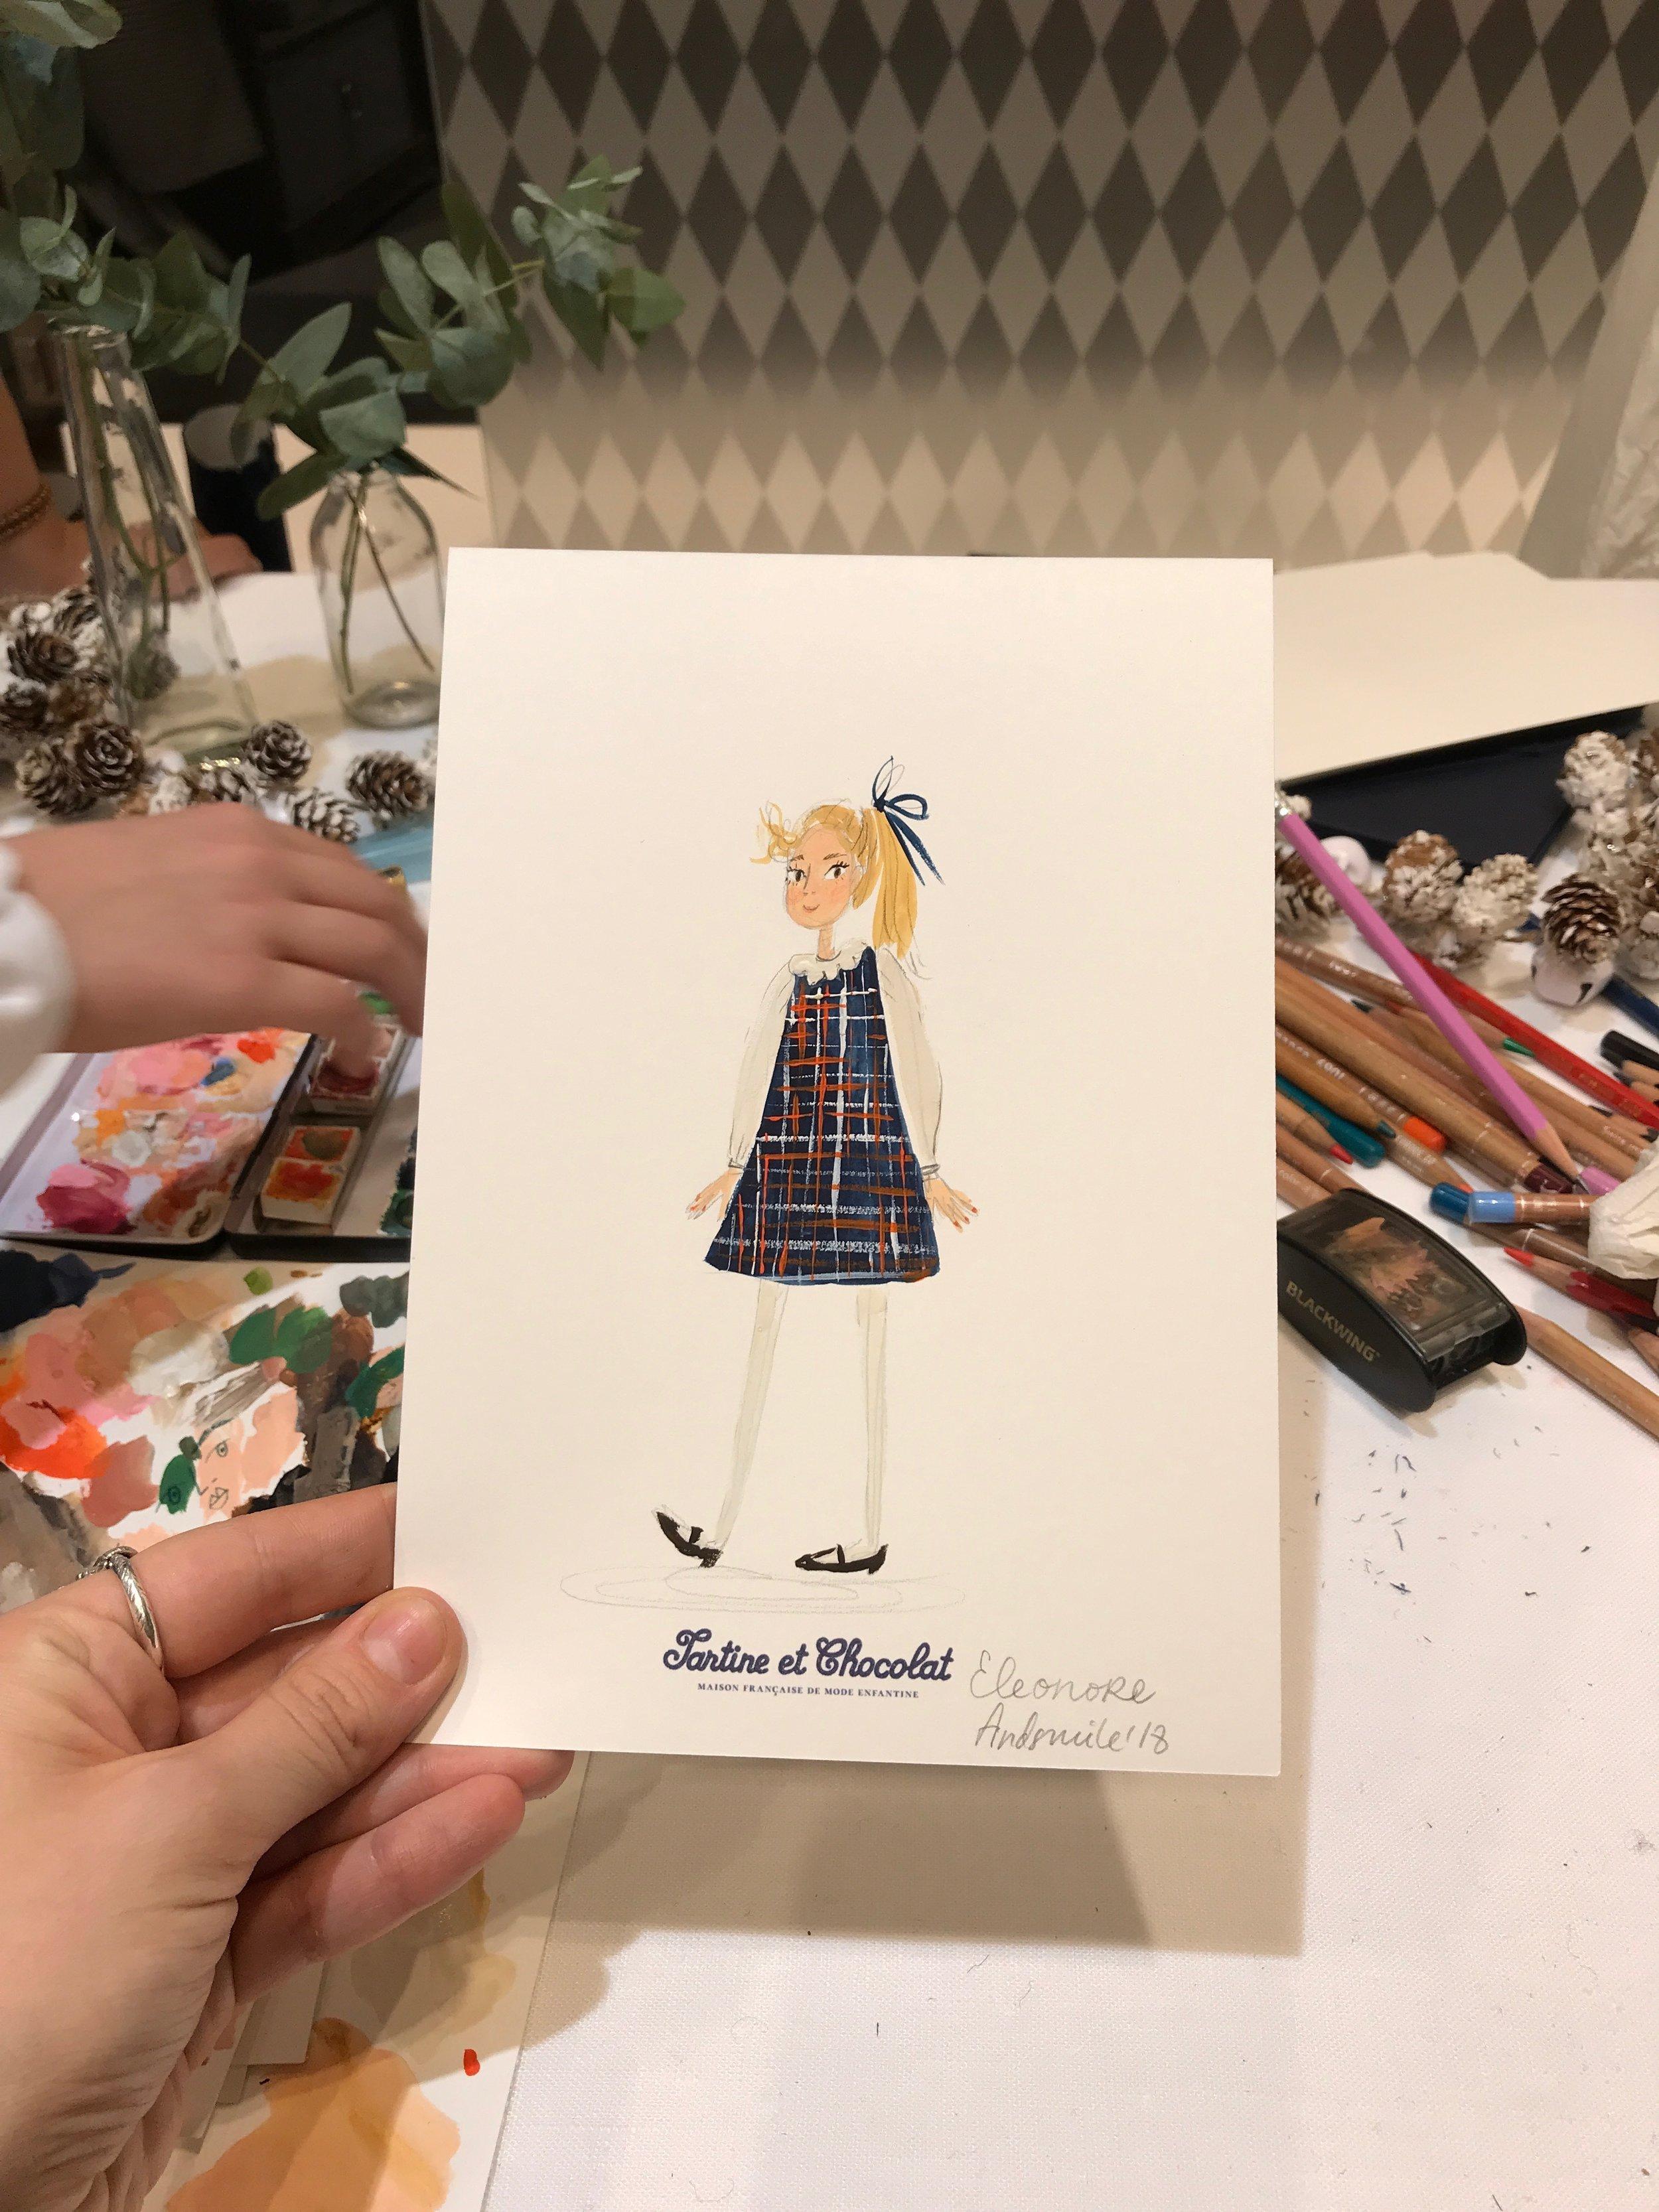 Viktorija Semjonova's childrens' portraits for Tartine et Chocolat